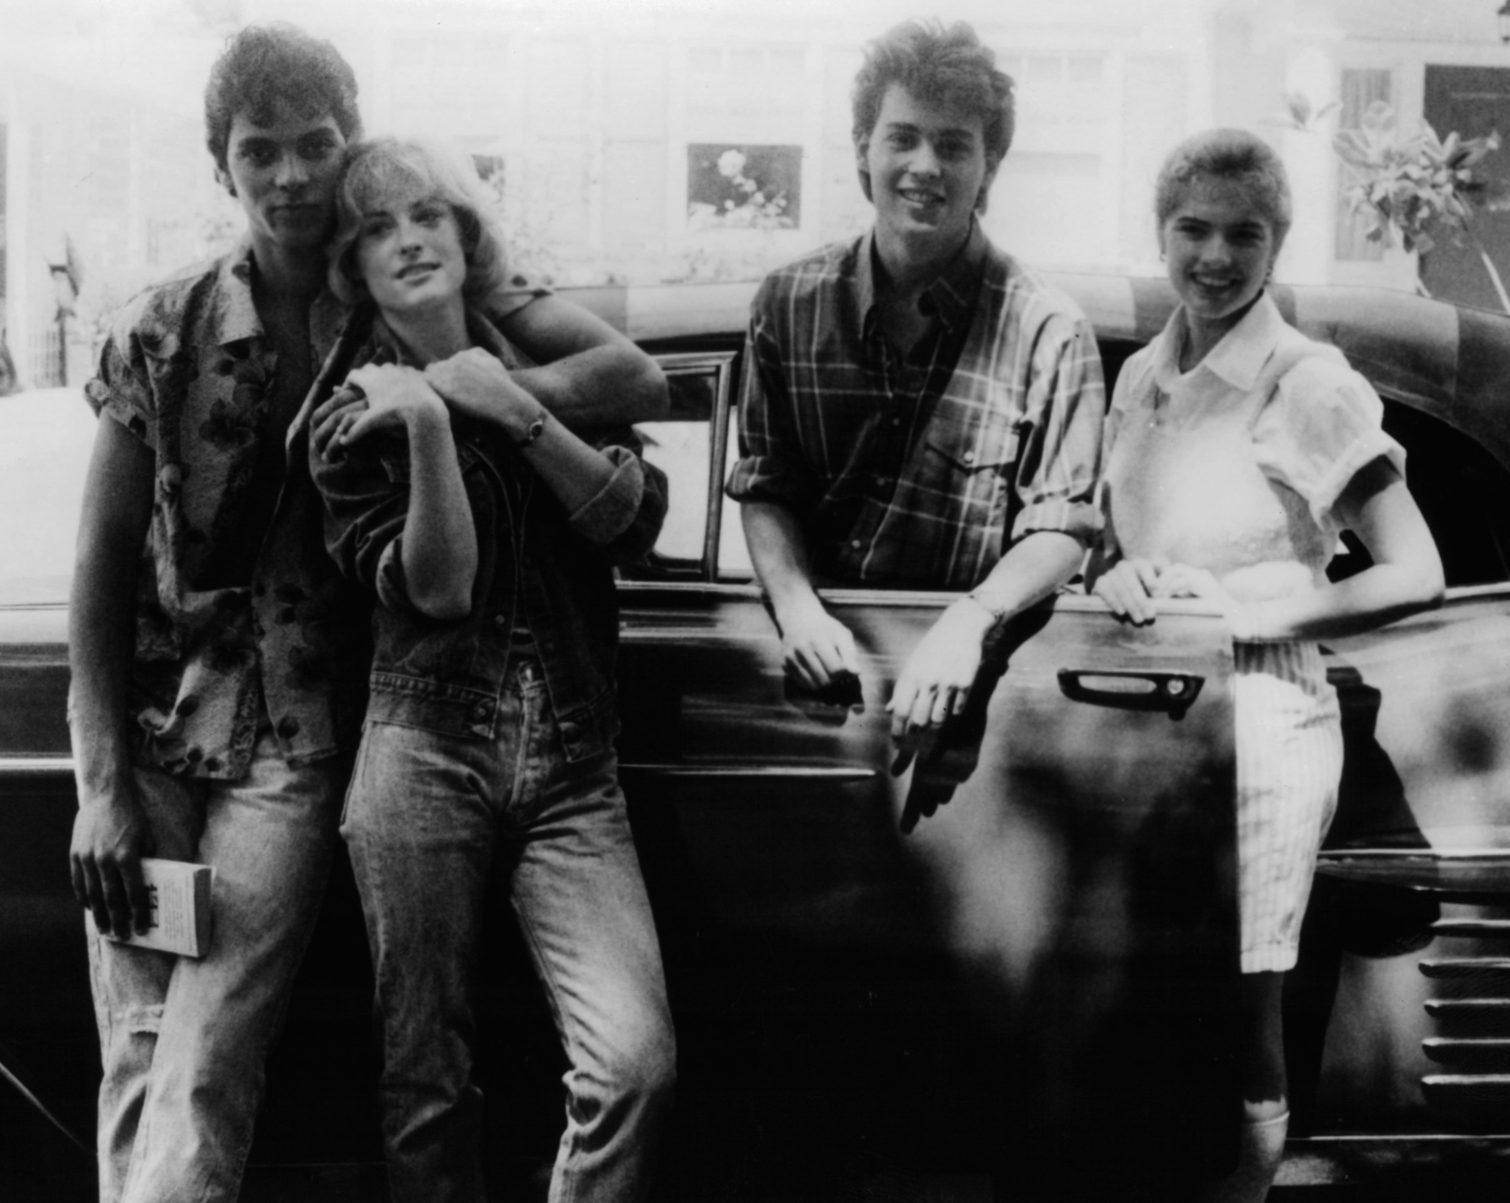 MV5BMjExNjU1MzAwOV5BMl5BanBnXkFtZTgwMTU0NzAzMTI@. V1 e1623417898791 A Nightmare On Elm Street Is Based On A True Story, And More You Never Knew About The Film